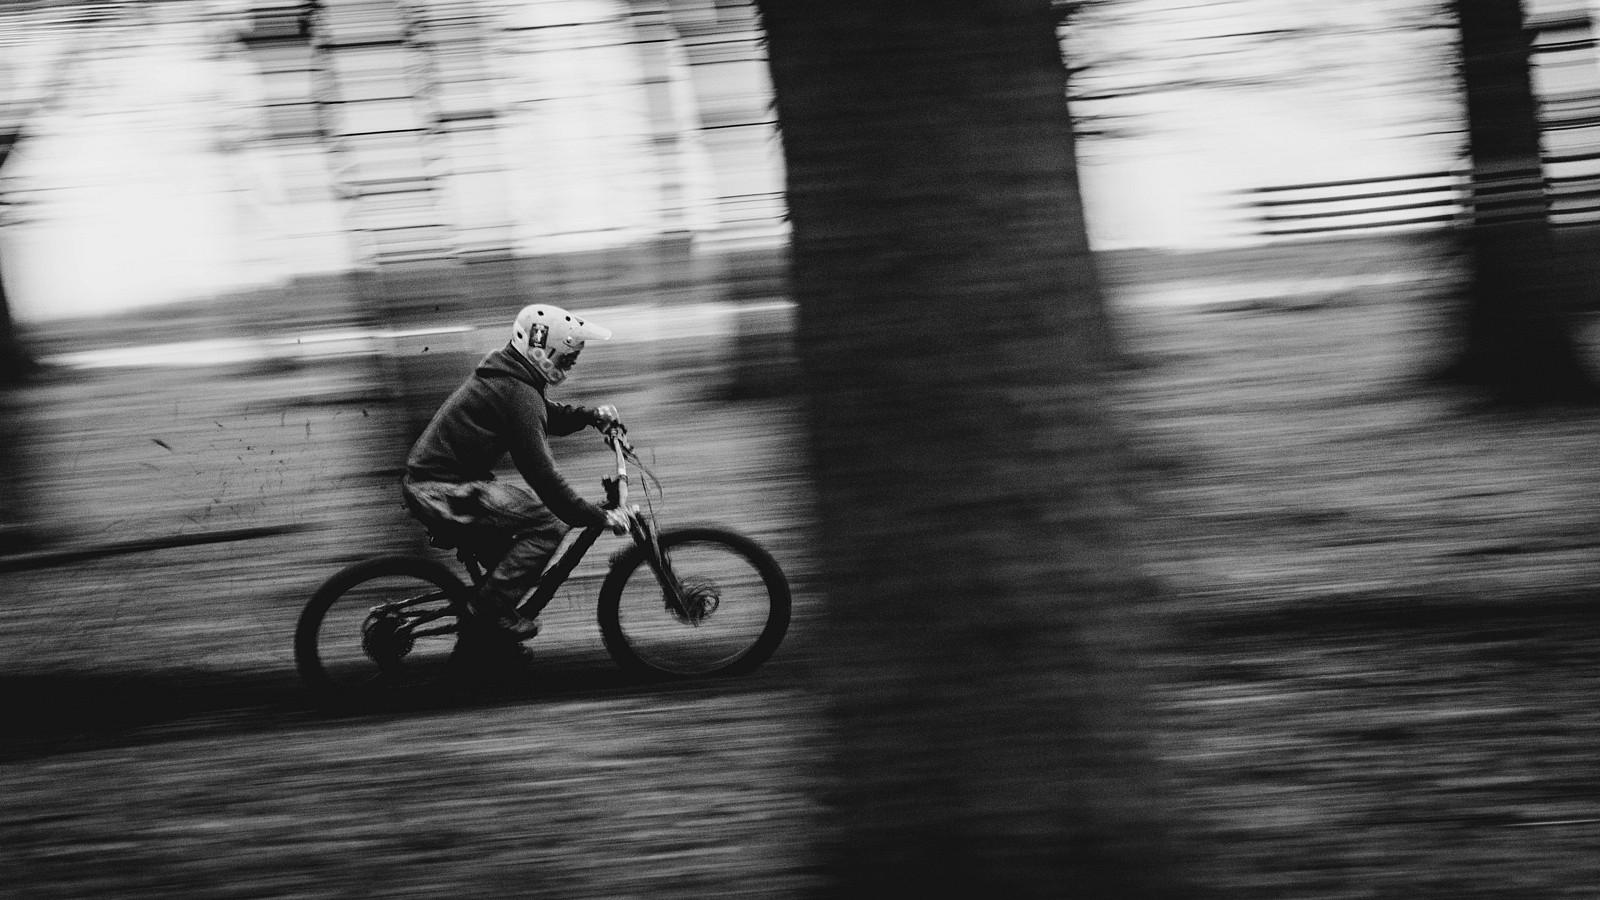 BnW Winter Panshots - Mushrum - Mountain Biking Pictures - Vital MTB